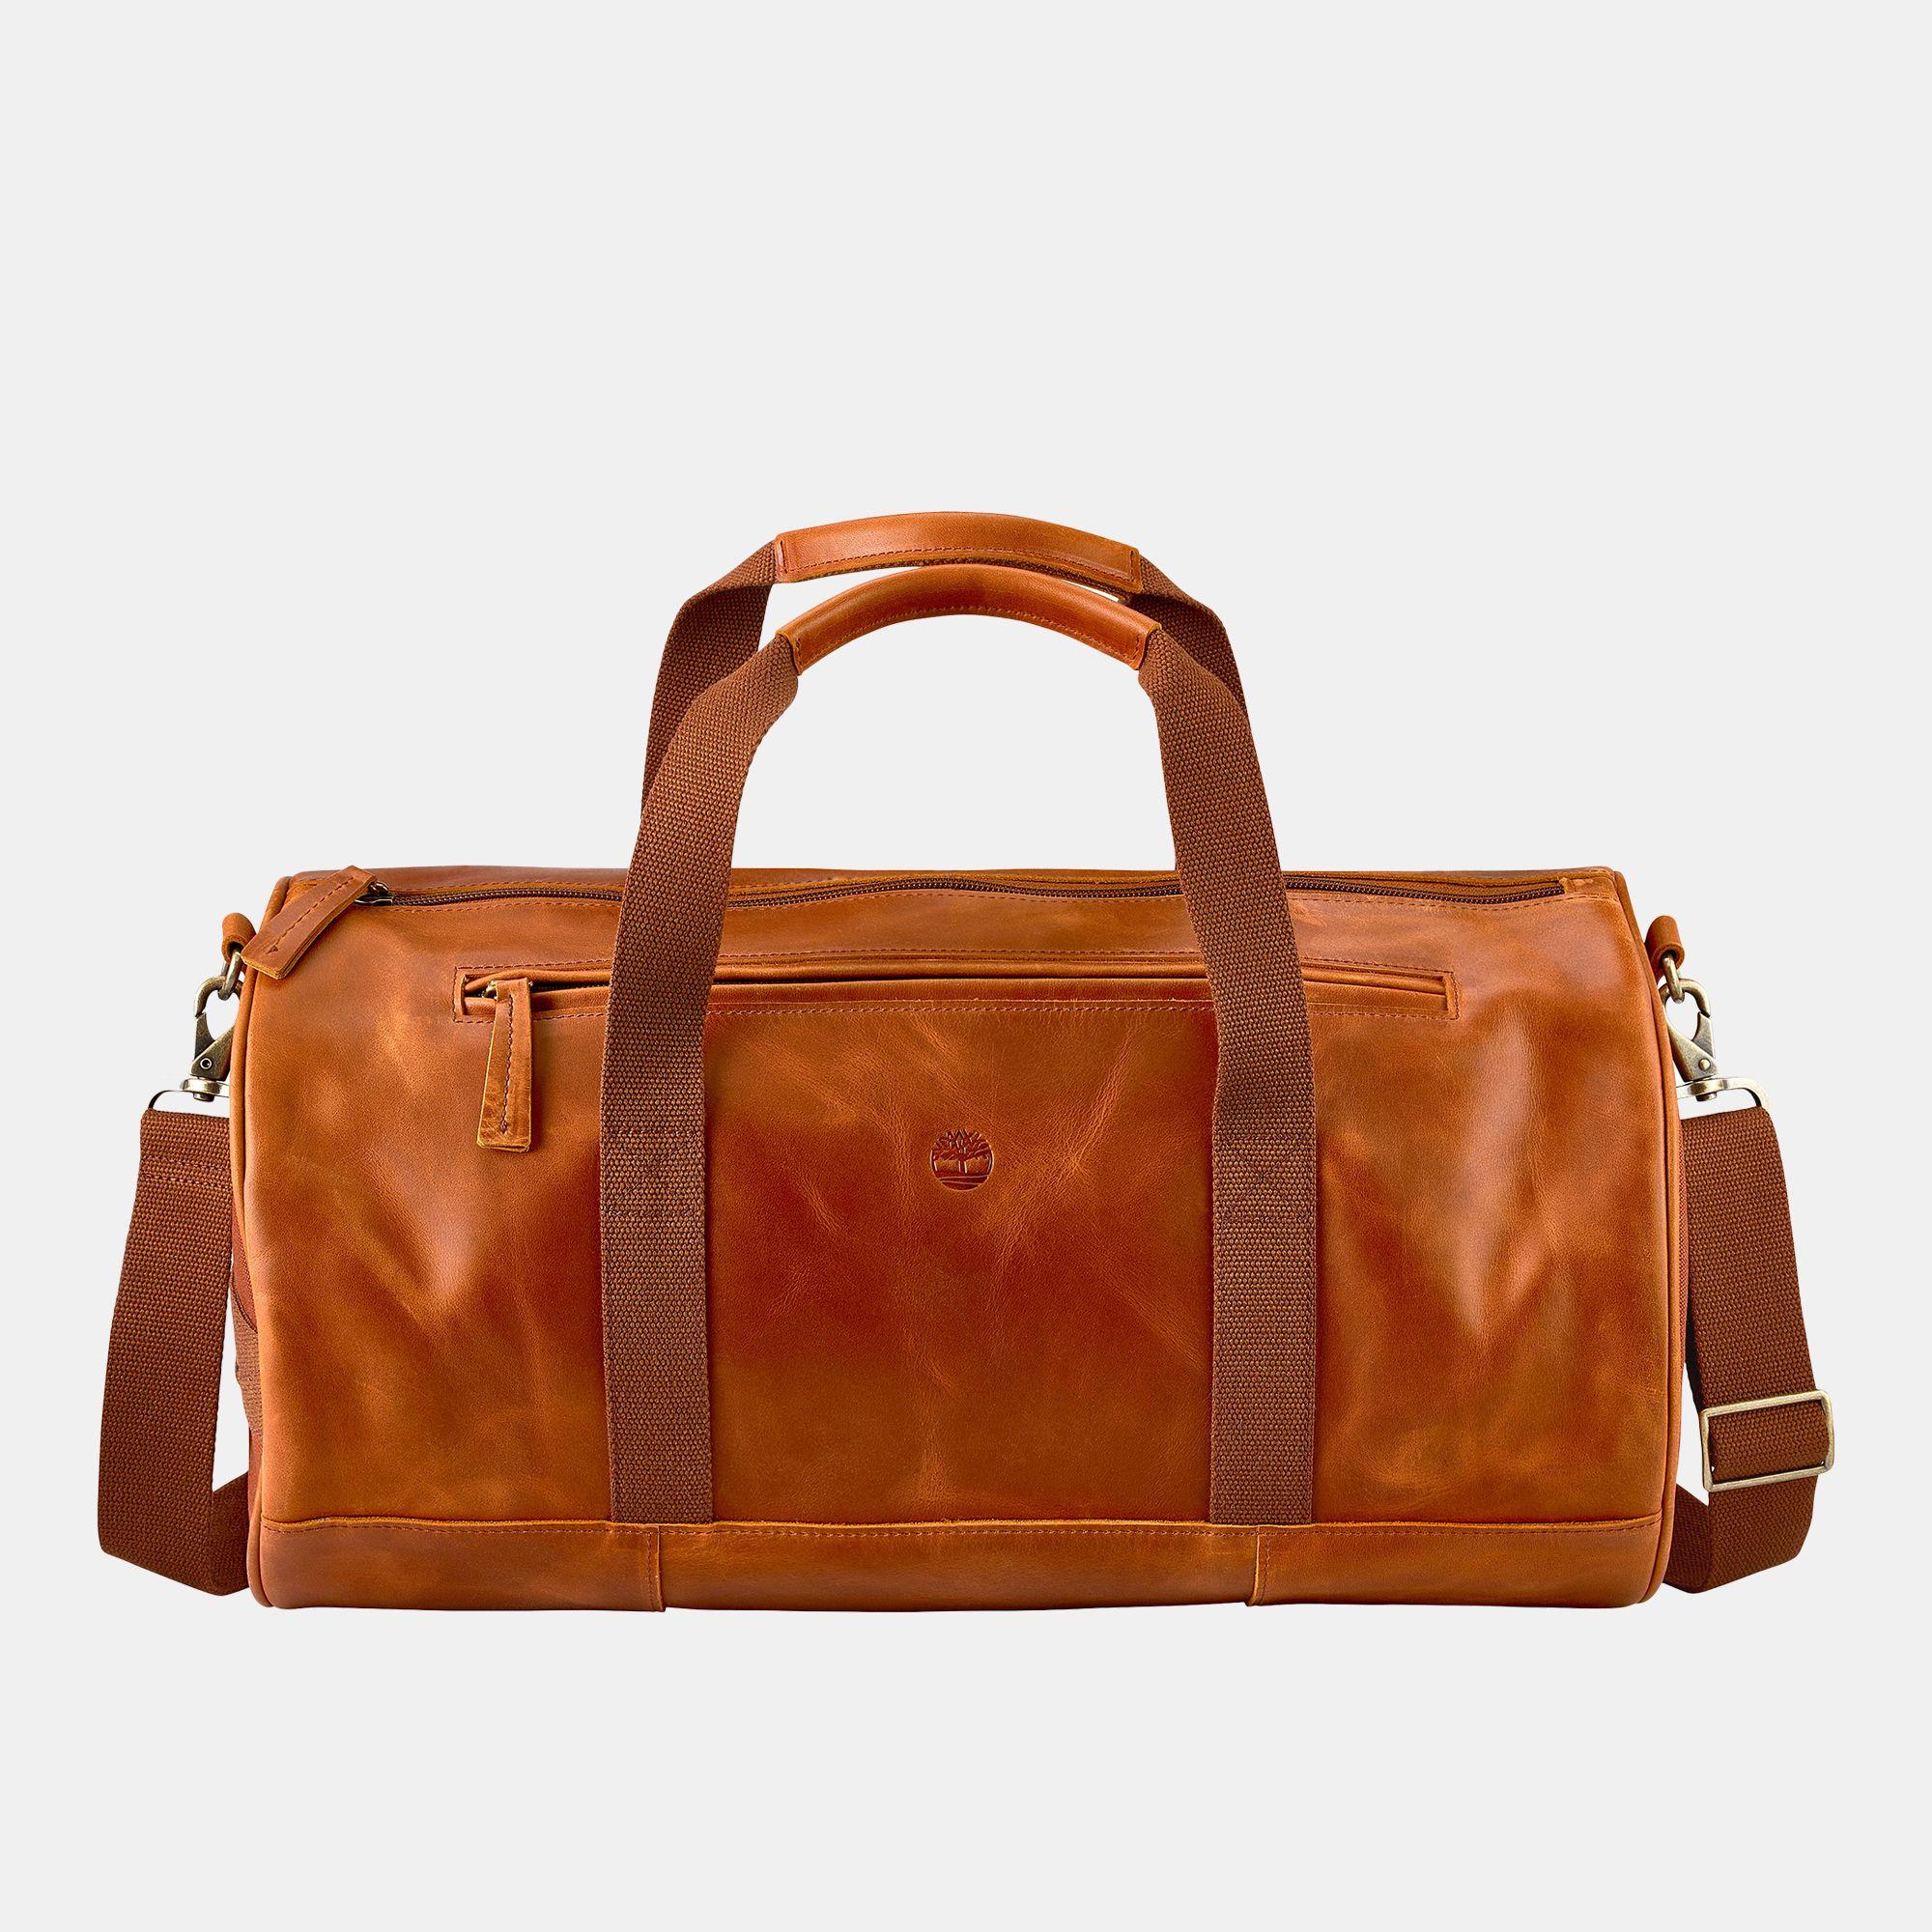 Timberland Tuckerman Leather Duffle Bag Brown